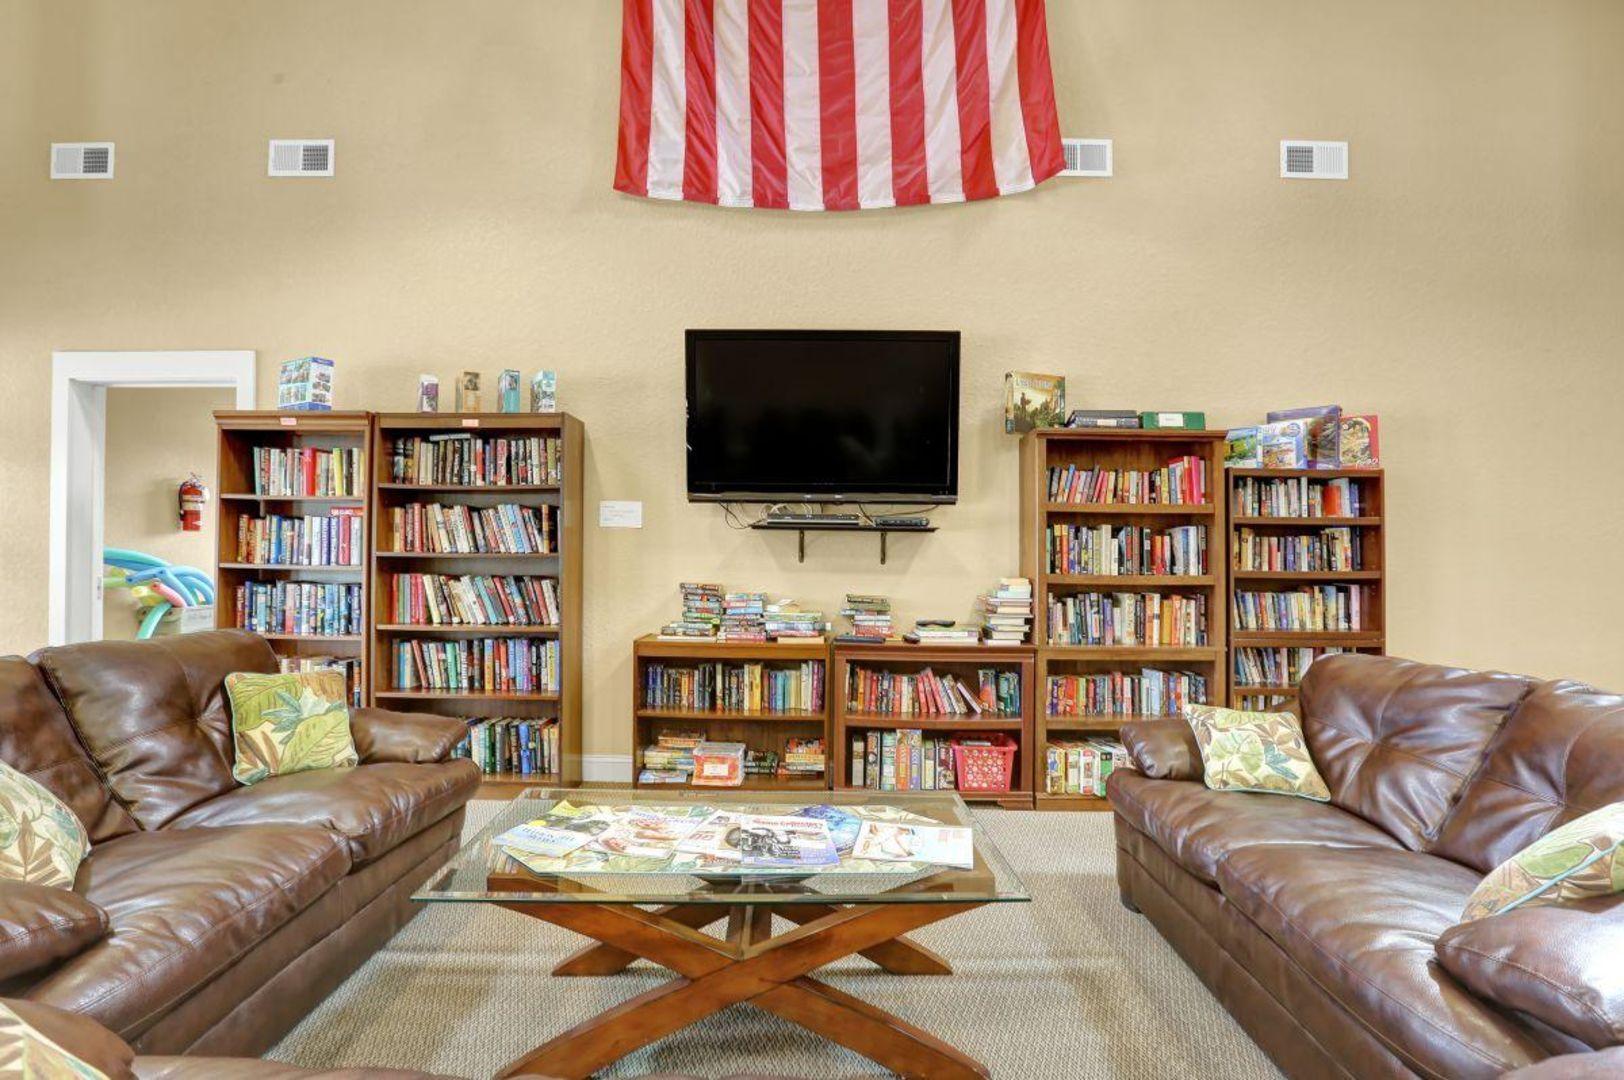 Single Family for Sale at Wrightsville 2098 Lindrick Court Calabash, North Carolina 28467 United States